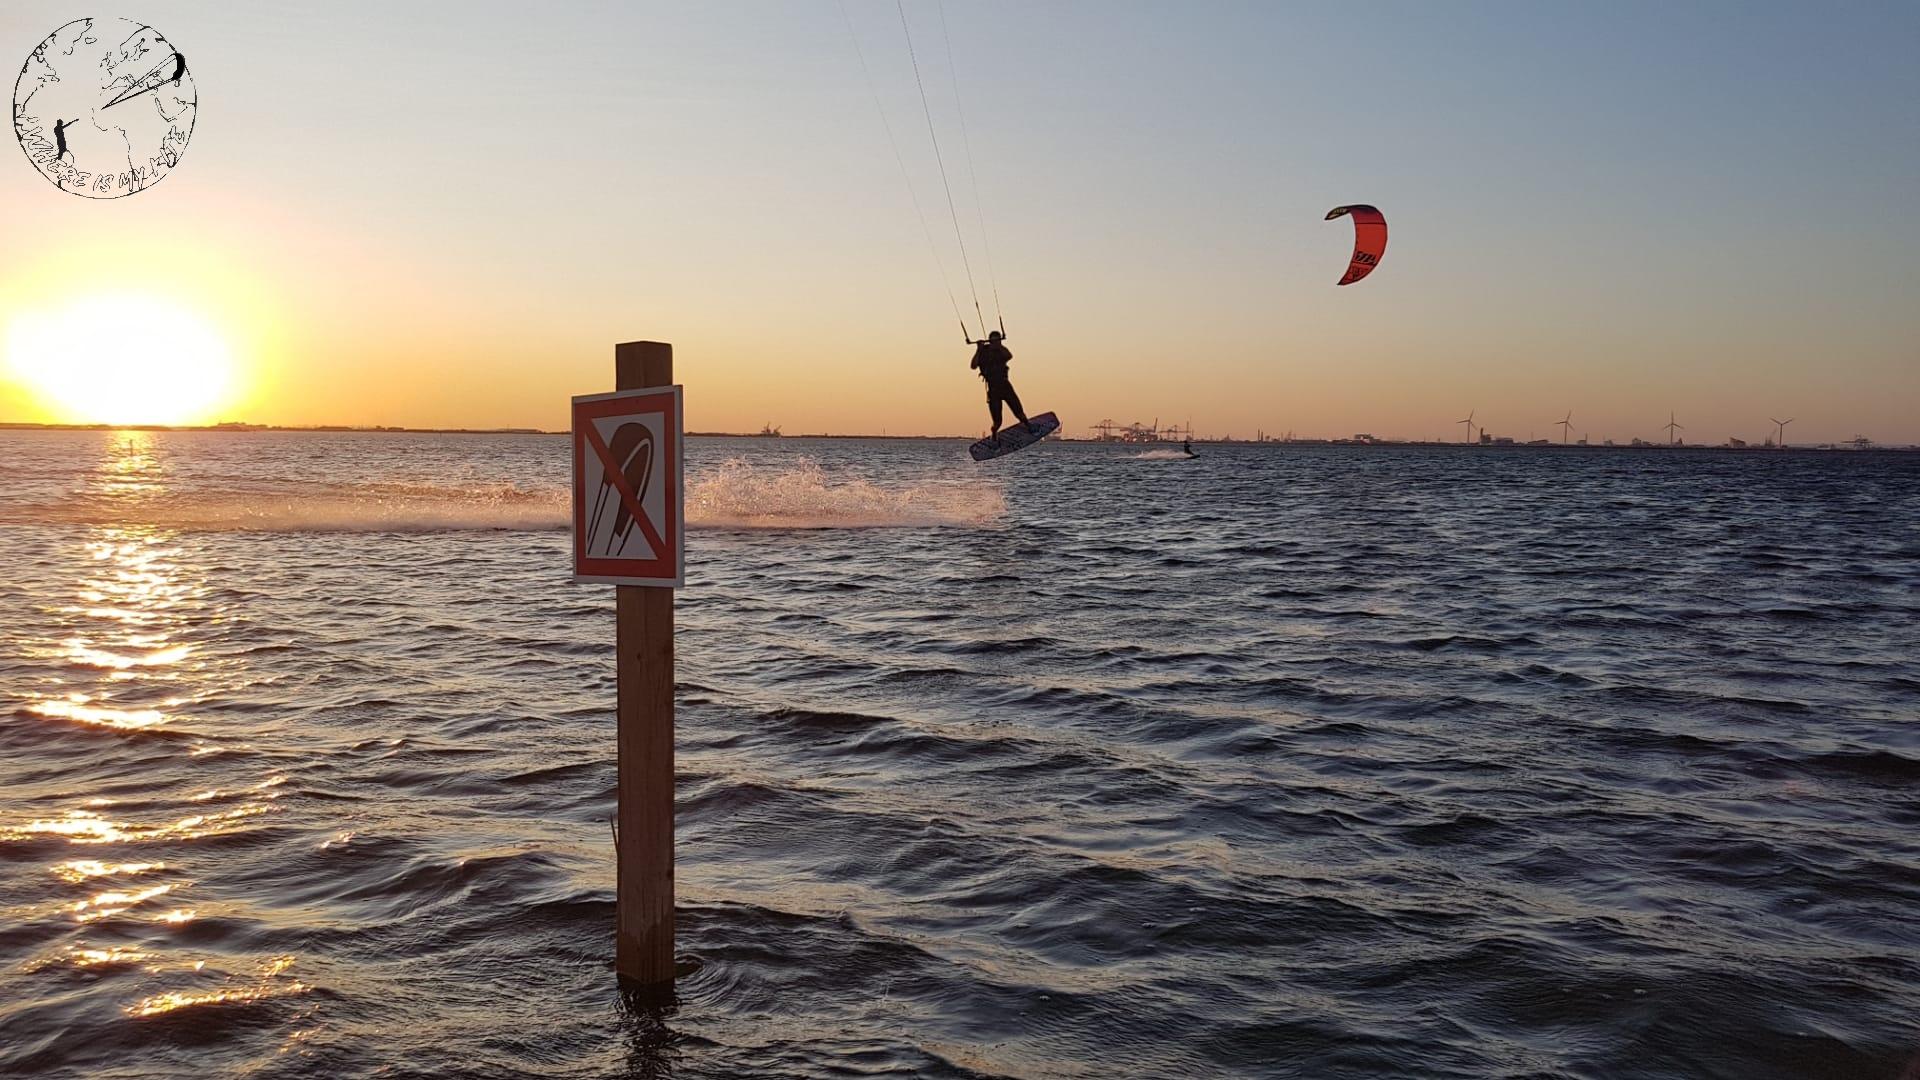 La Graçieuse au sunset, spot de kitesurf en France